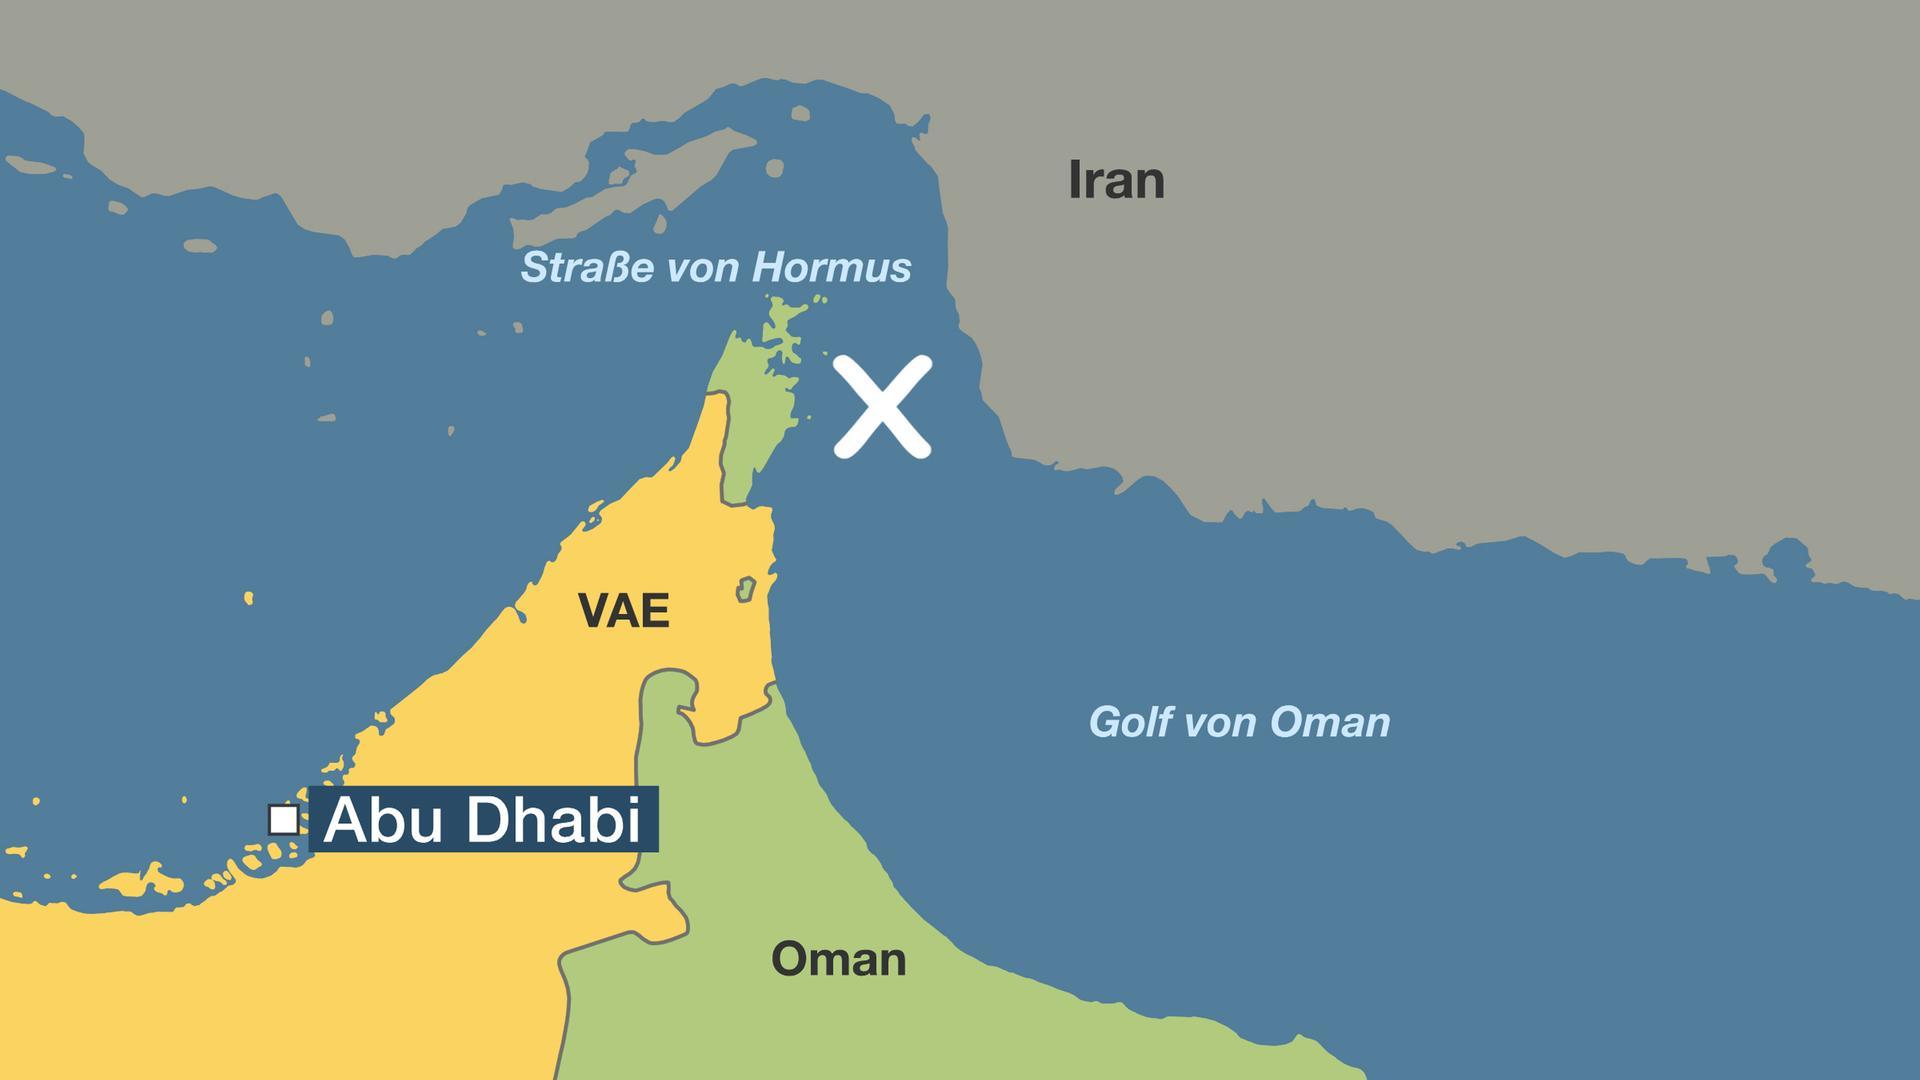 Karte Oman.Straße Von Hormus Wichtige öl Transportroute Im Fokus Zdfmediathek